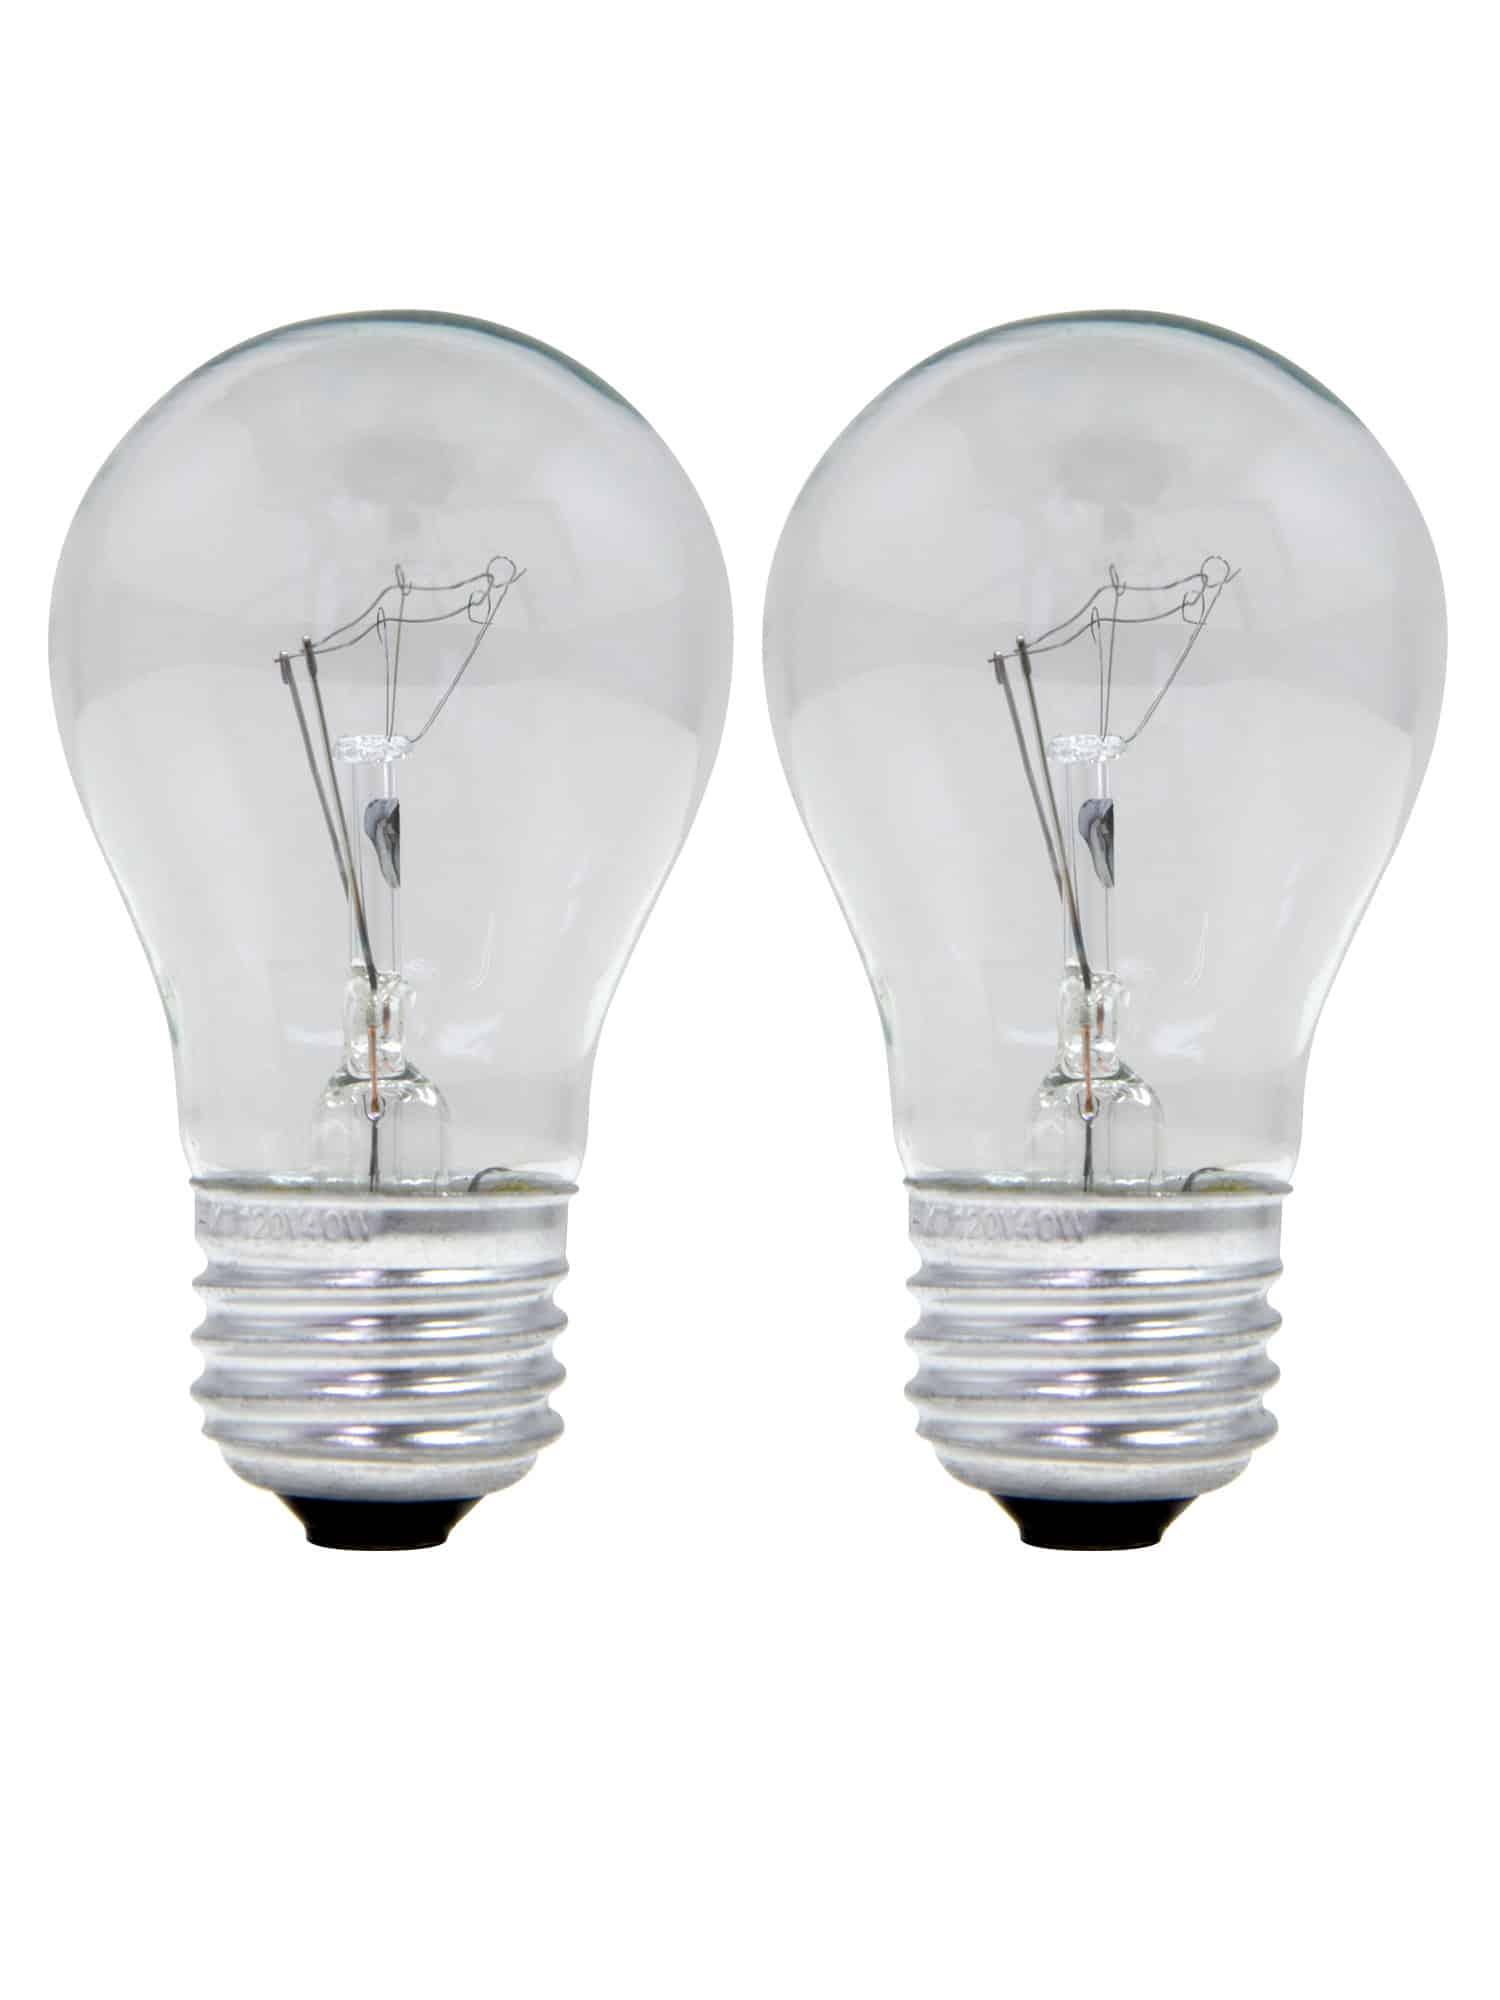 5032 40 Watt Light Bulb 2 Pack Lava 174 Lamp